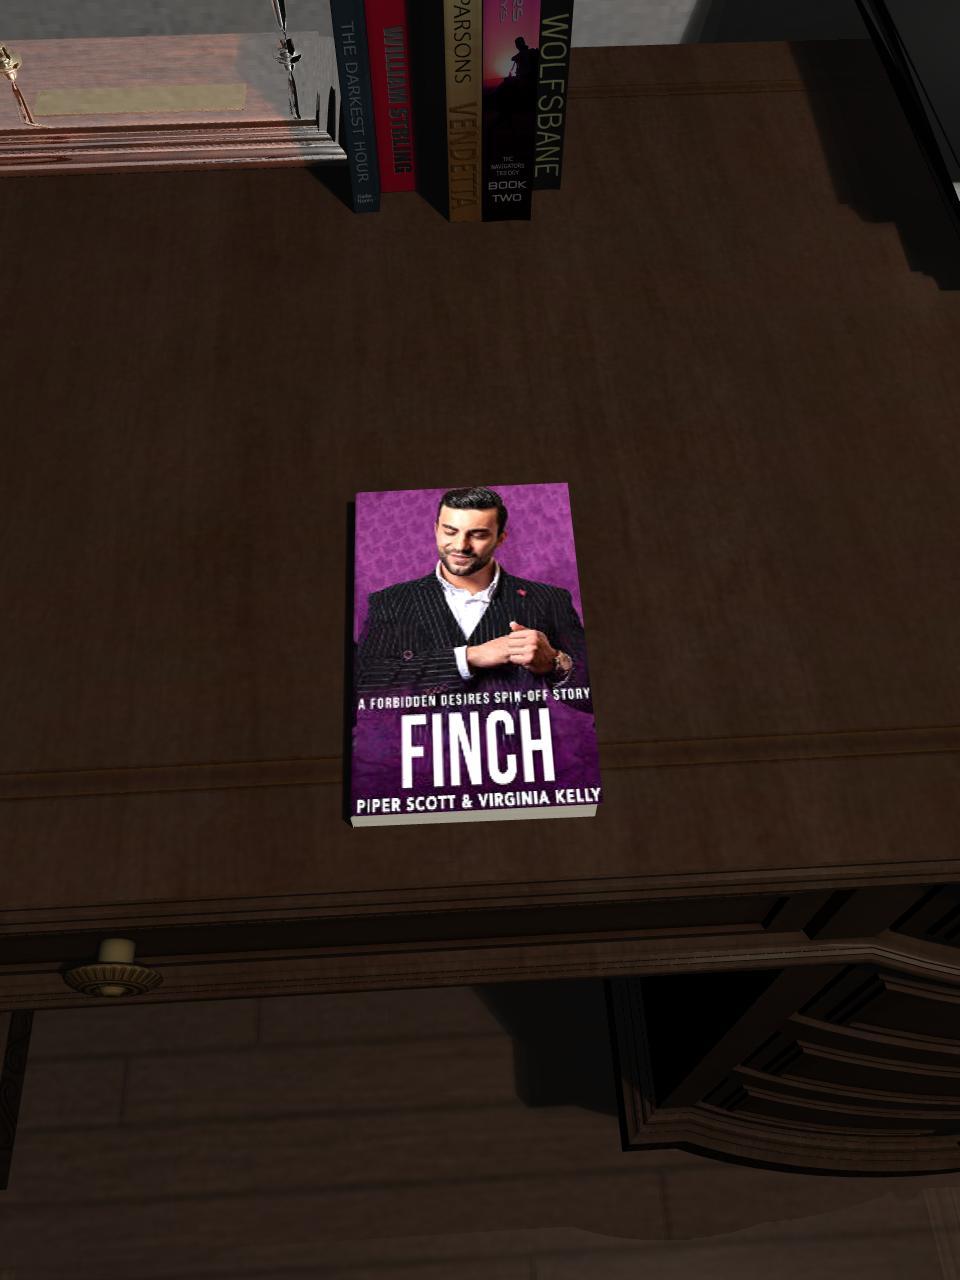 Finch: A Forbidden Desires Spin-OffStory